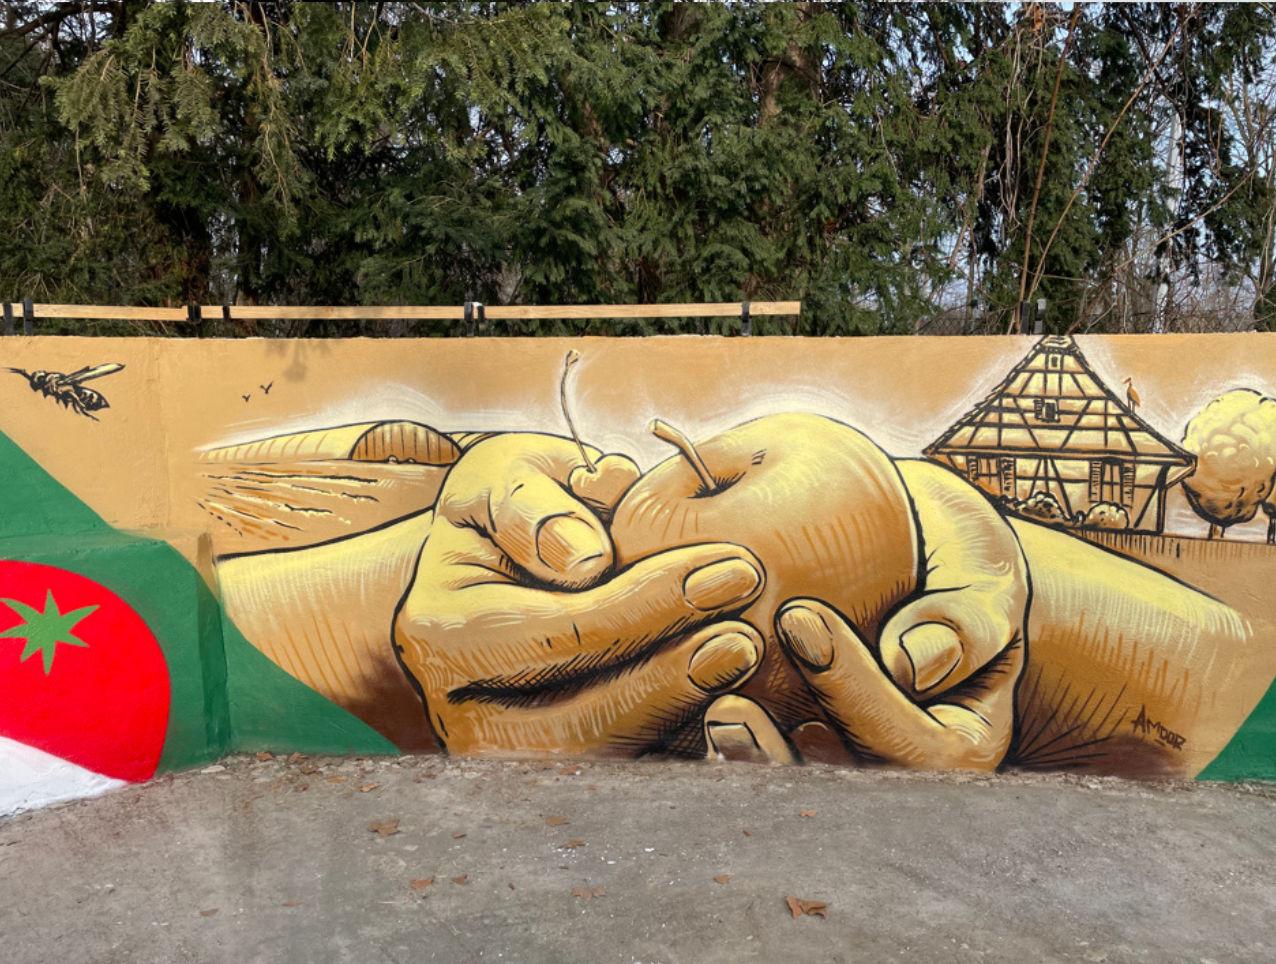 Fresque mains et fruits peinture art urbain graffiti street art